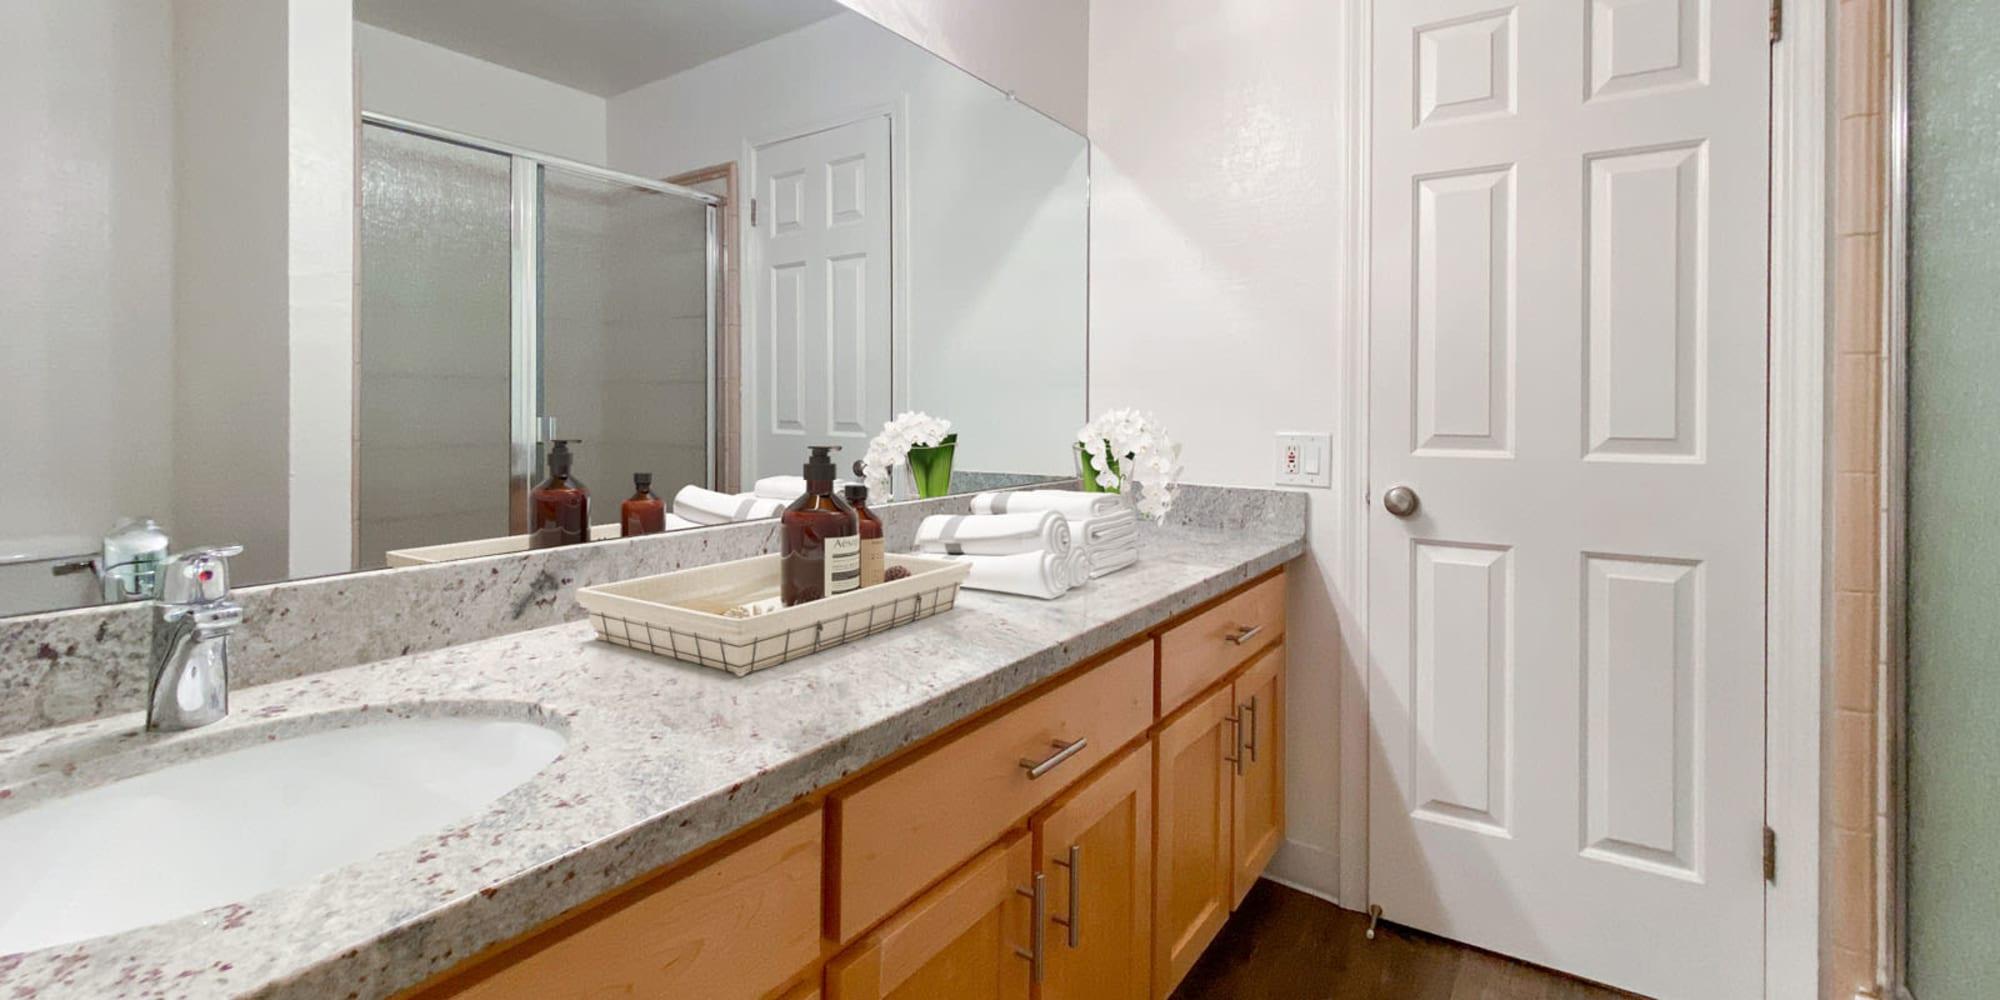 Granite countertop in a model apartment's bathroom at Pleasanton Glen Apartment Homes in Pleasanton, California